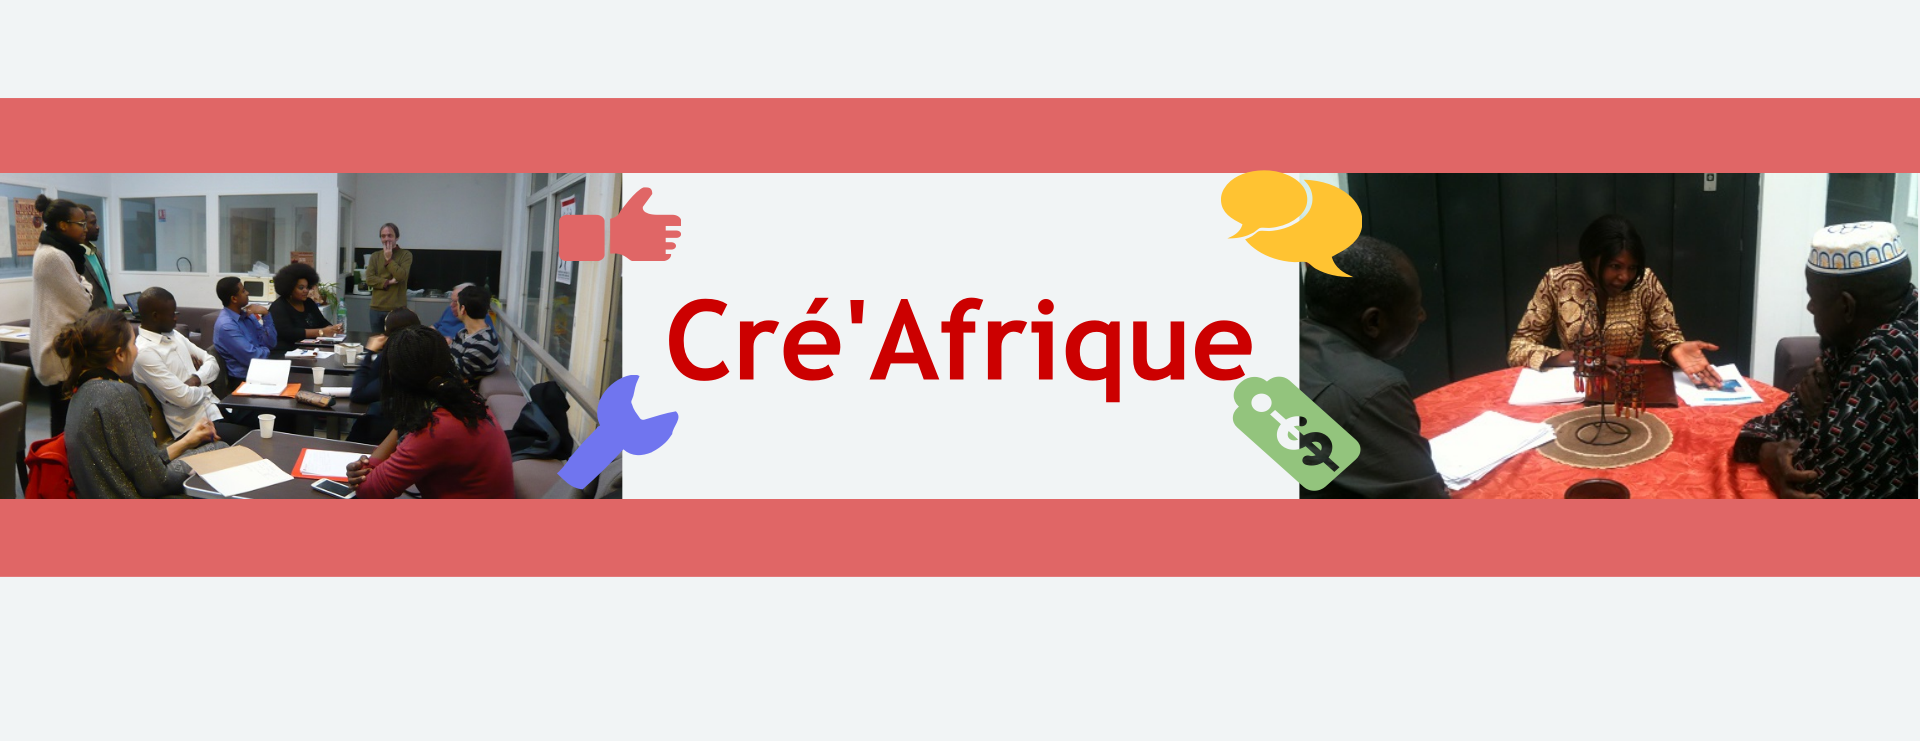 Soutenir les initiatives des diasporas africaines